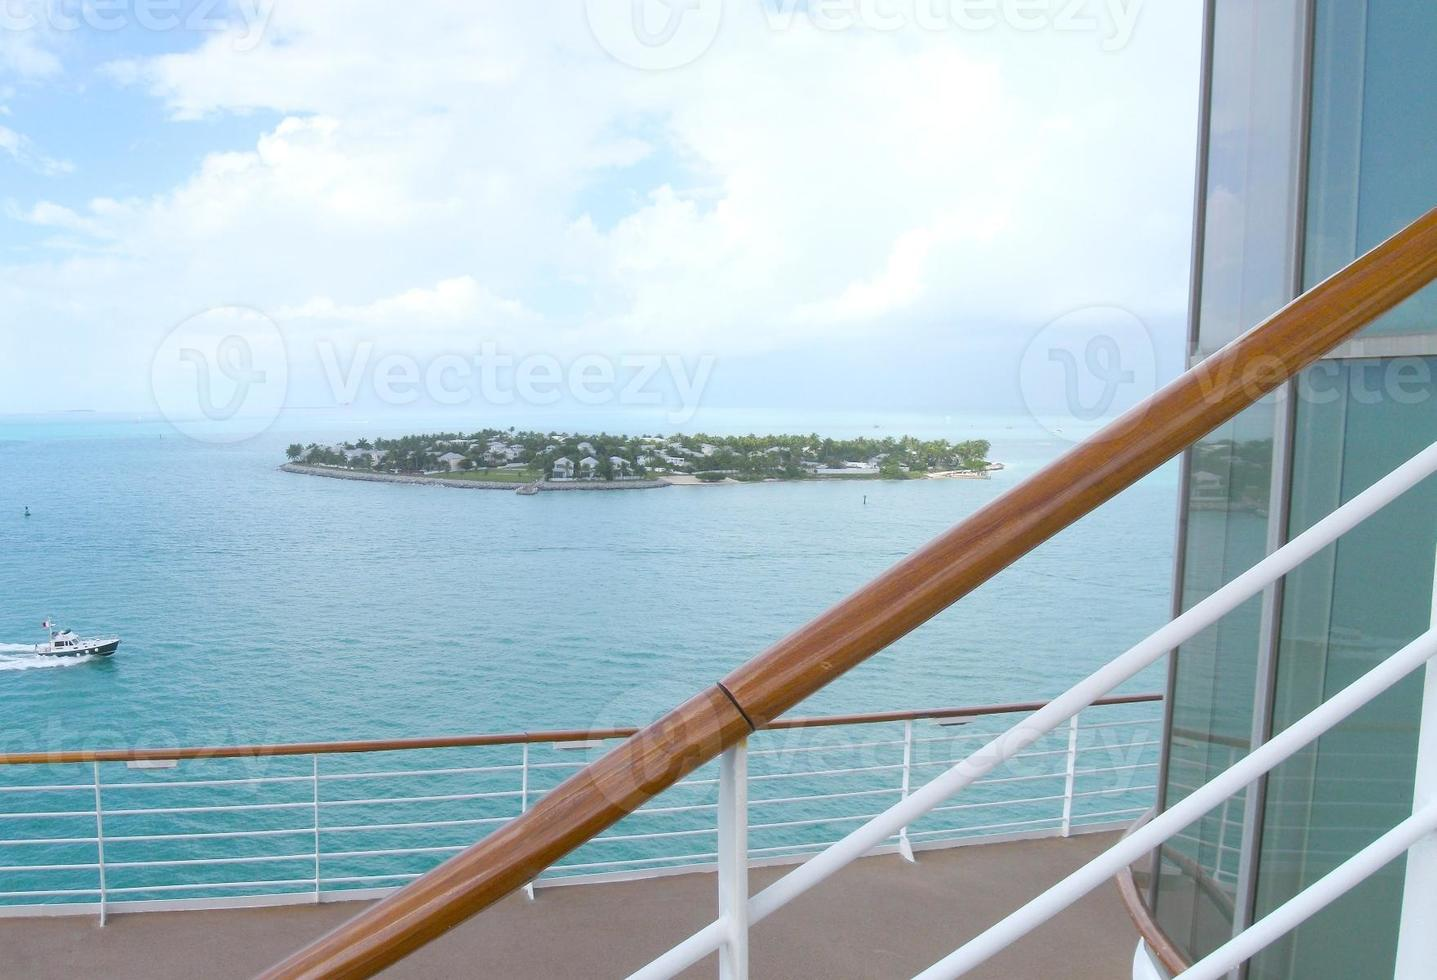 Cruise ship deck scenery photo